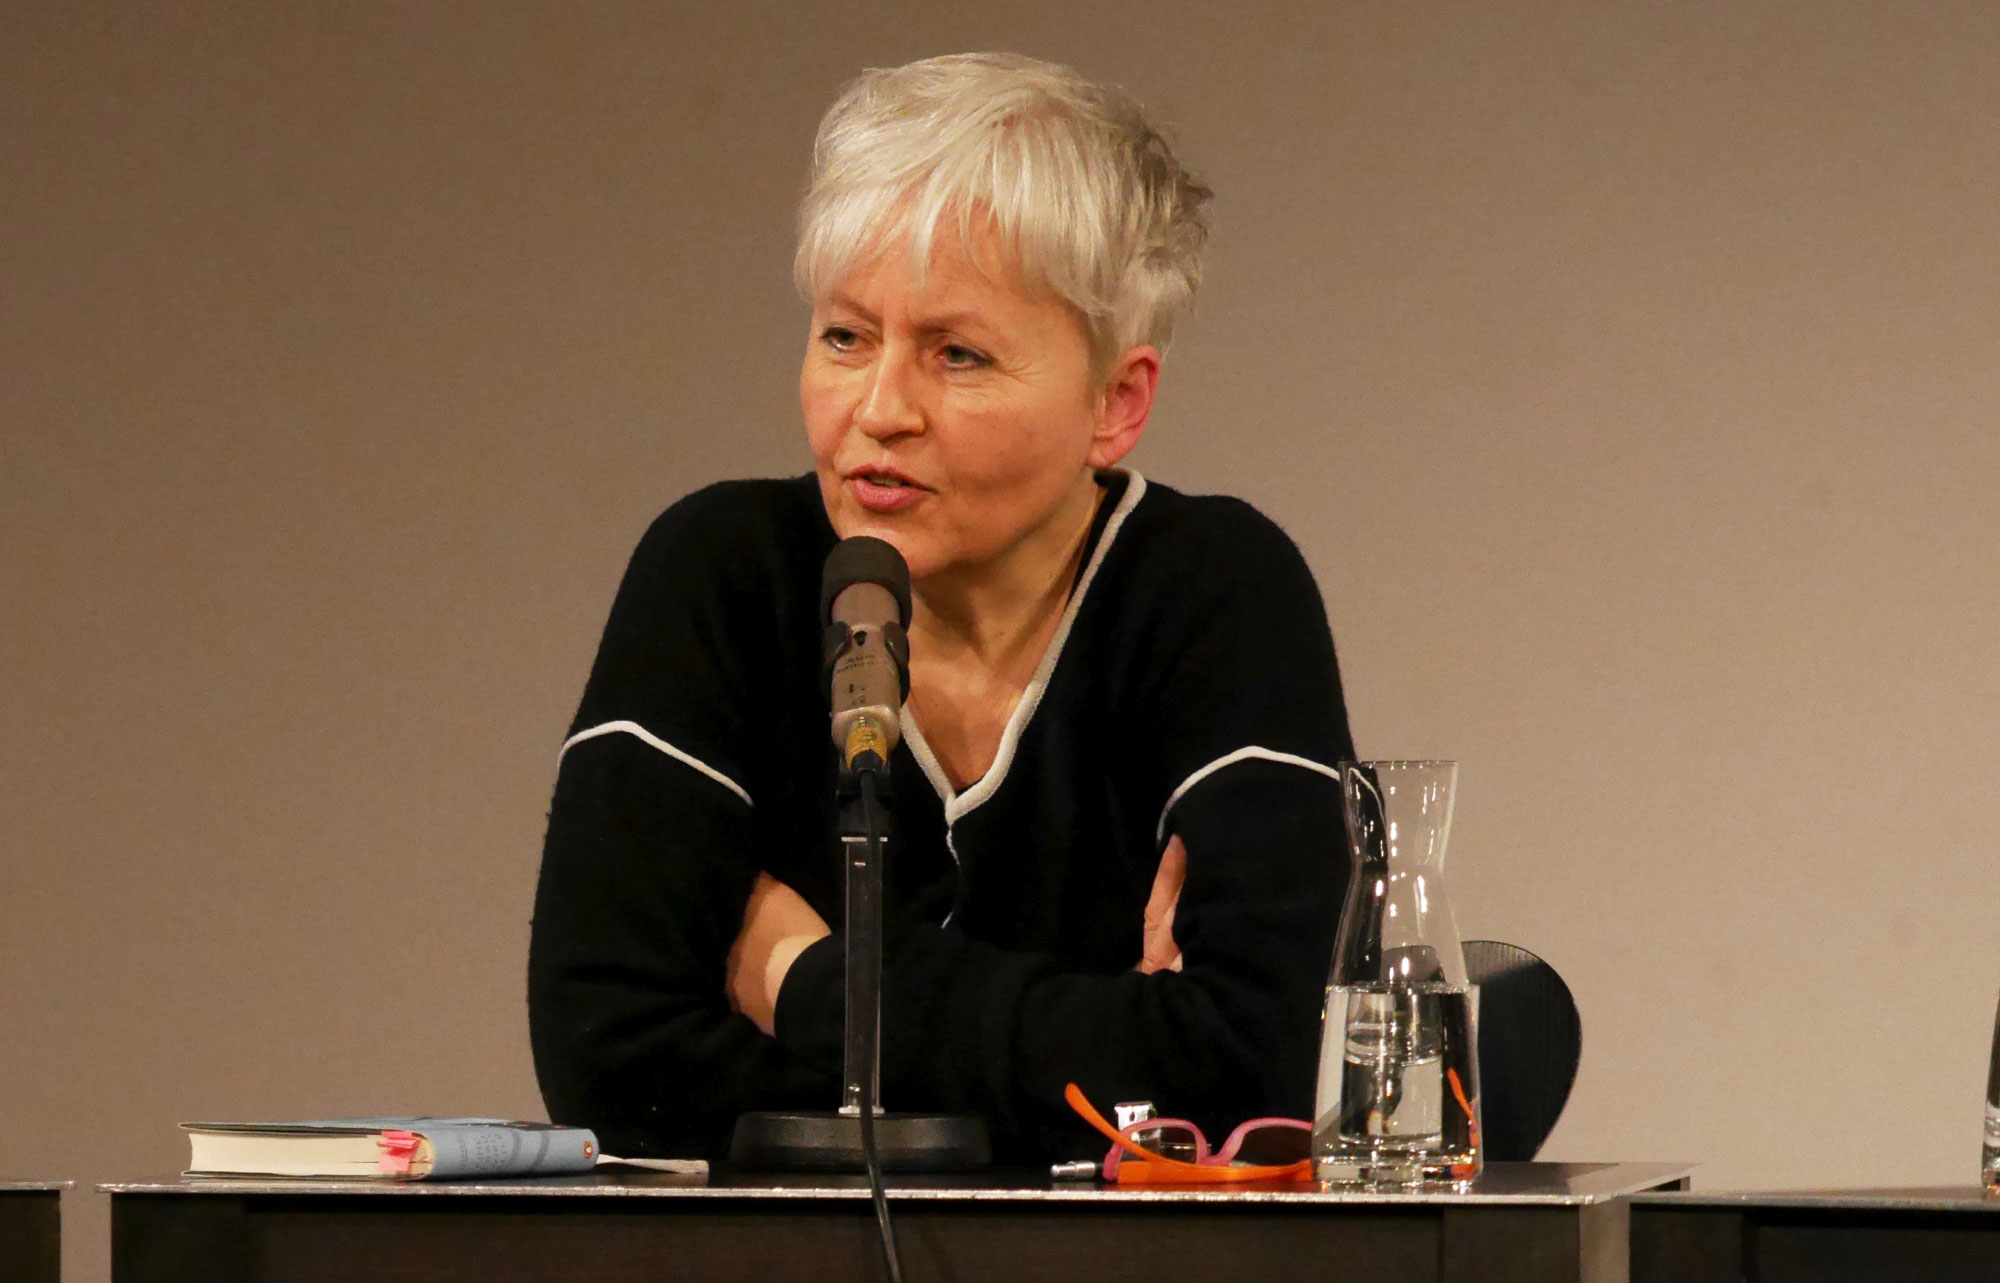 Ulrike Draesner, Elisabeth Bronfen: Eine Frau wird älter <br/>(c) Simon Adolphi